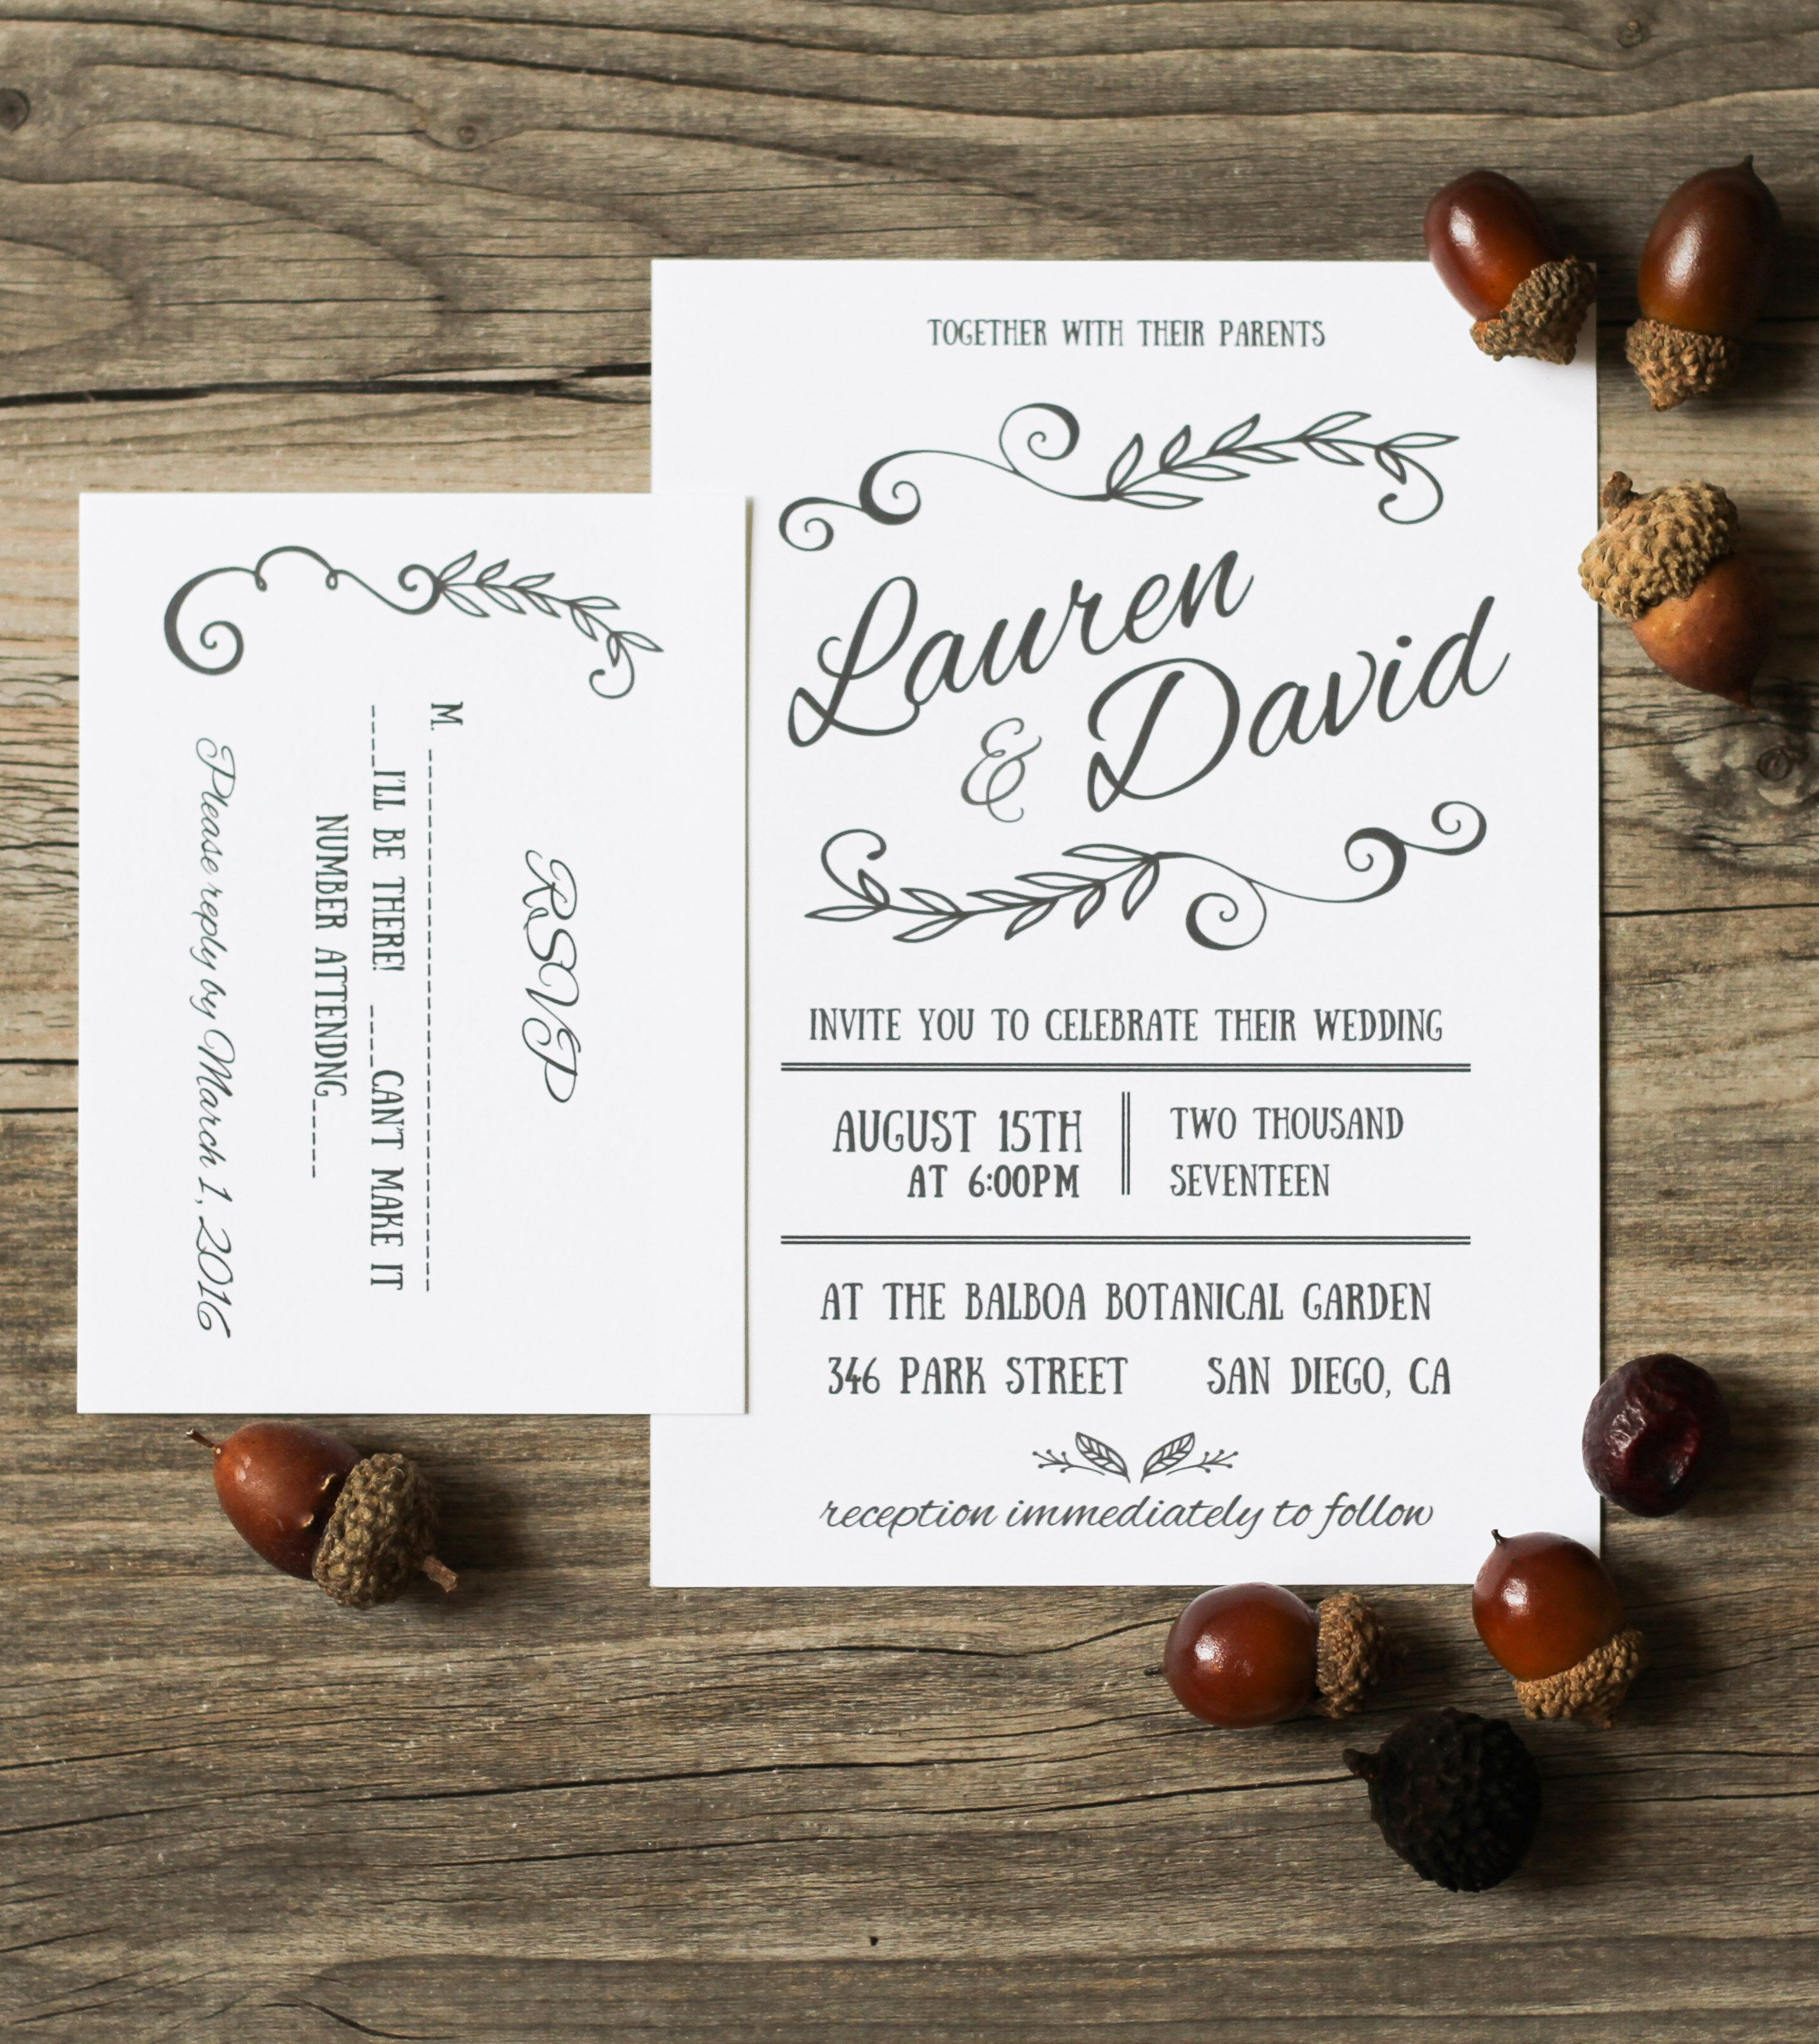 Diy Microsoft Word Invitation Templates That You Can Make At Home - Free Printable Wedding Invitation Templates For Microsoft Word